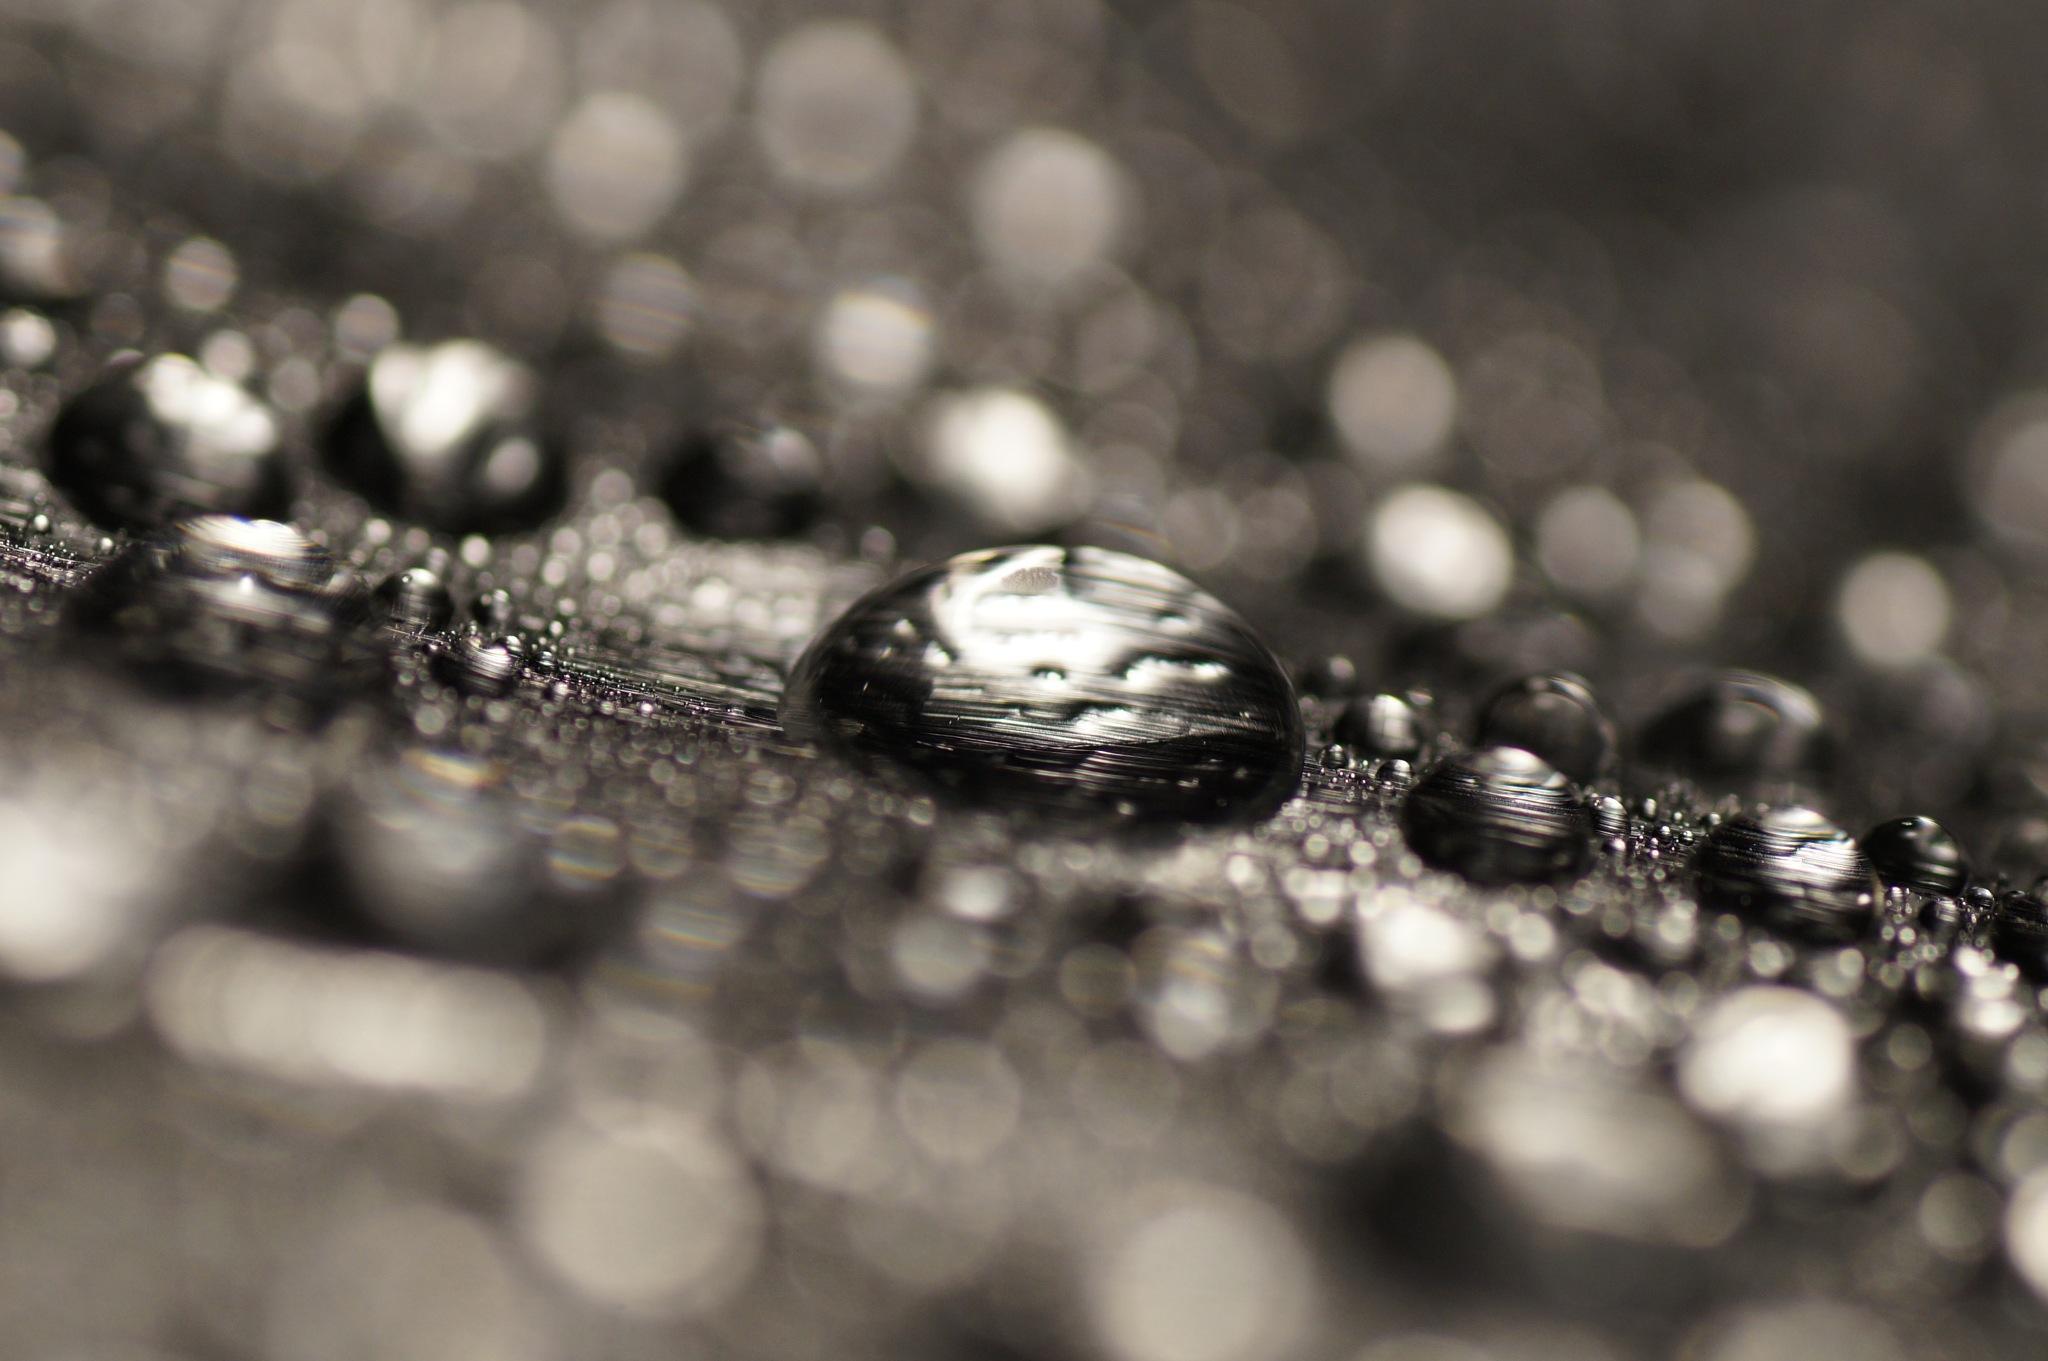 Steel water drops by sylviecorriveau